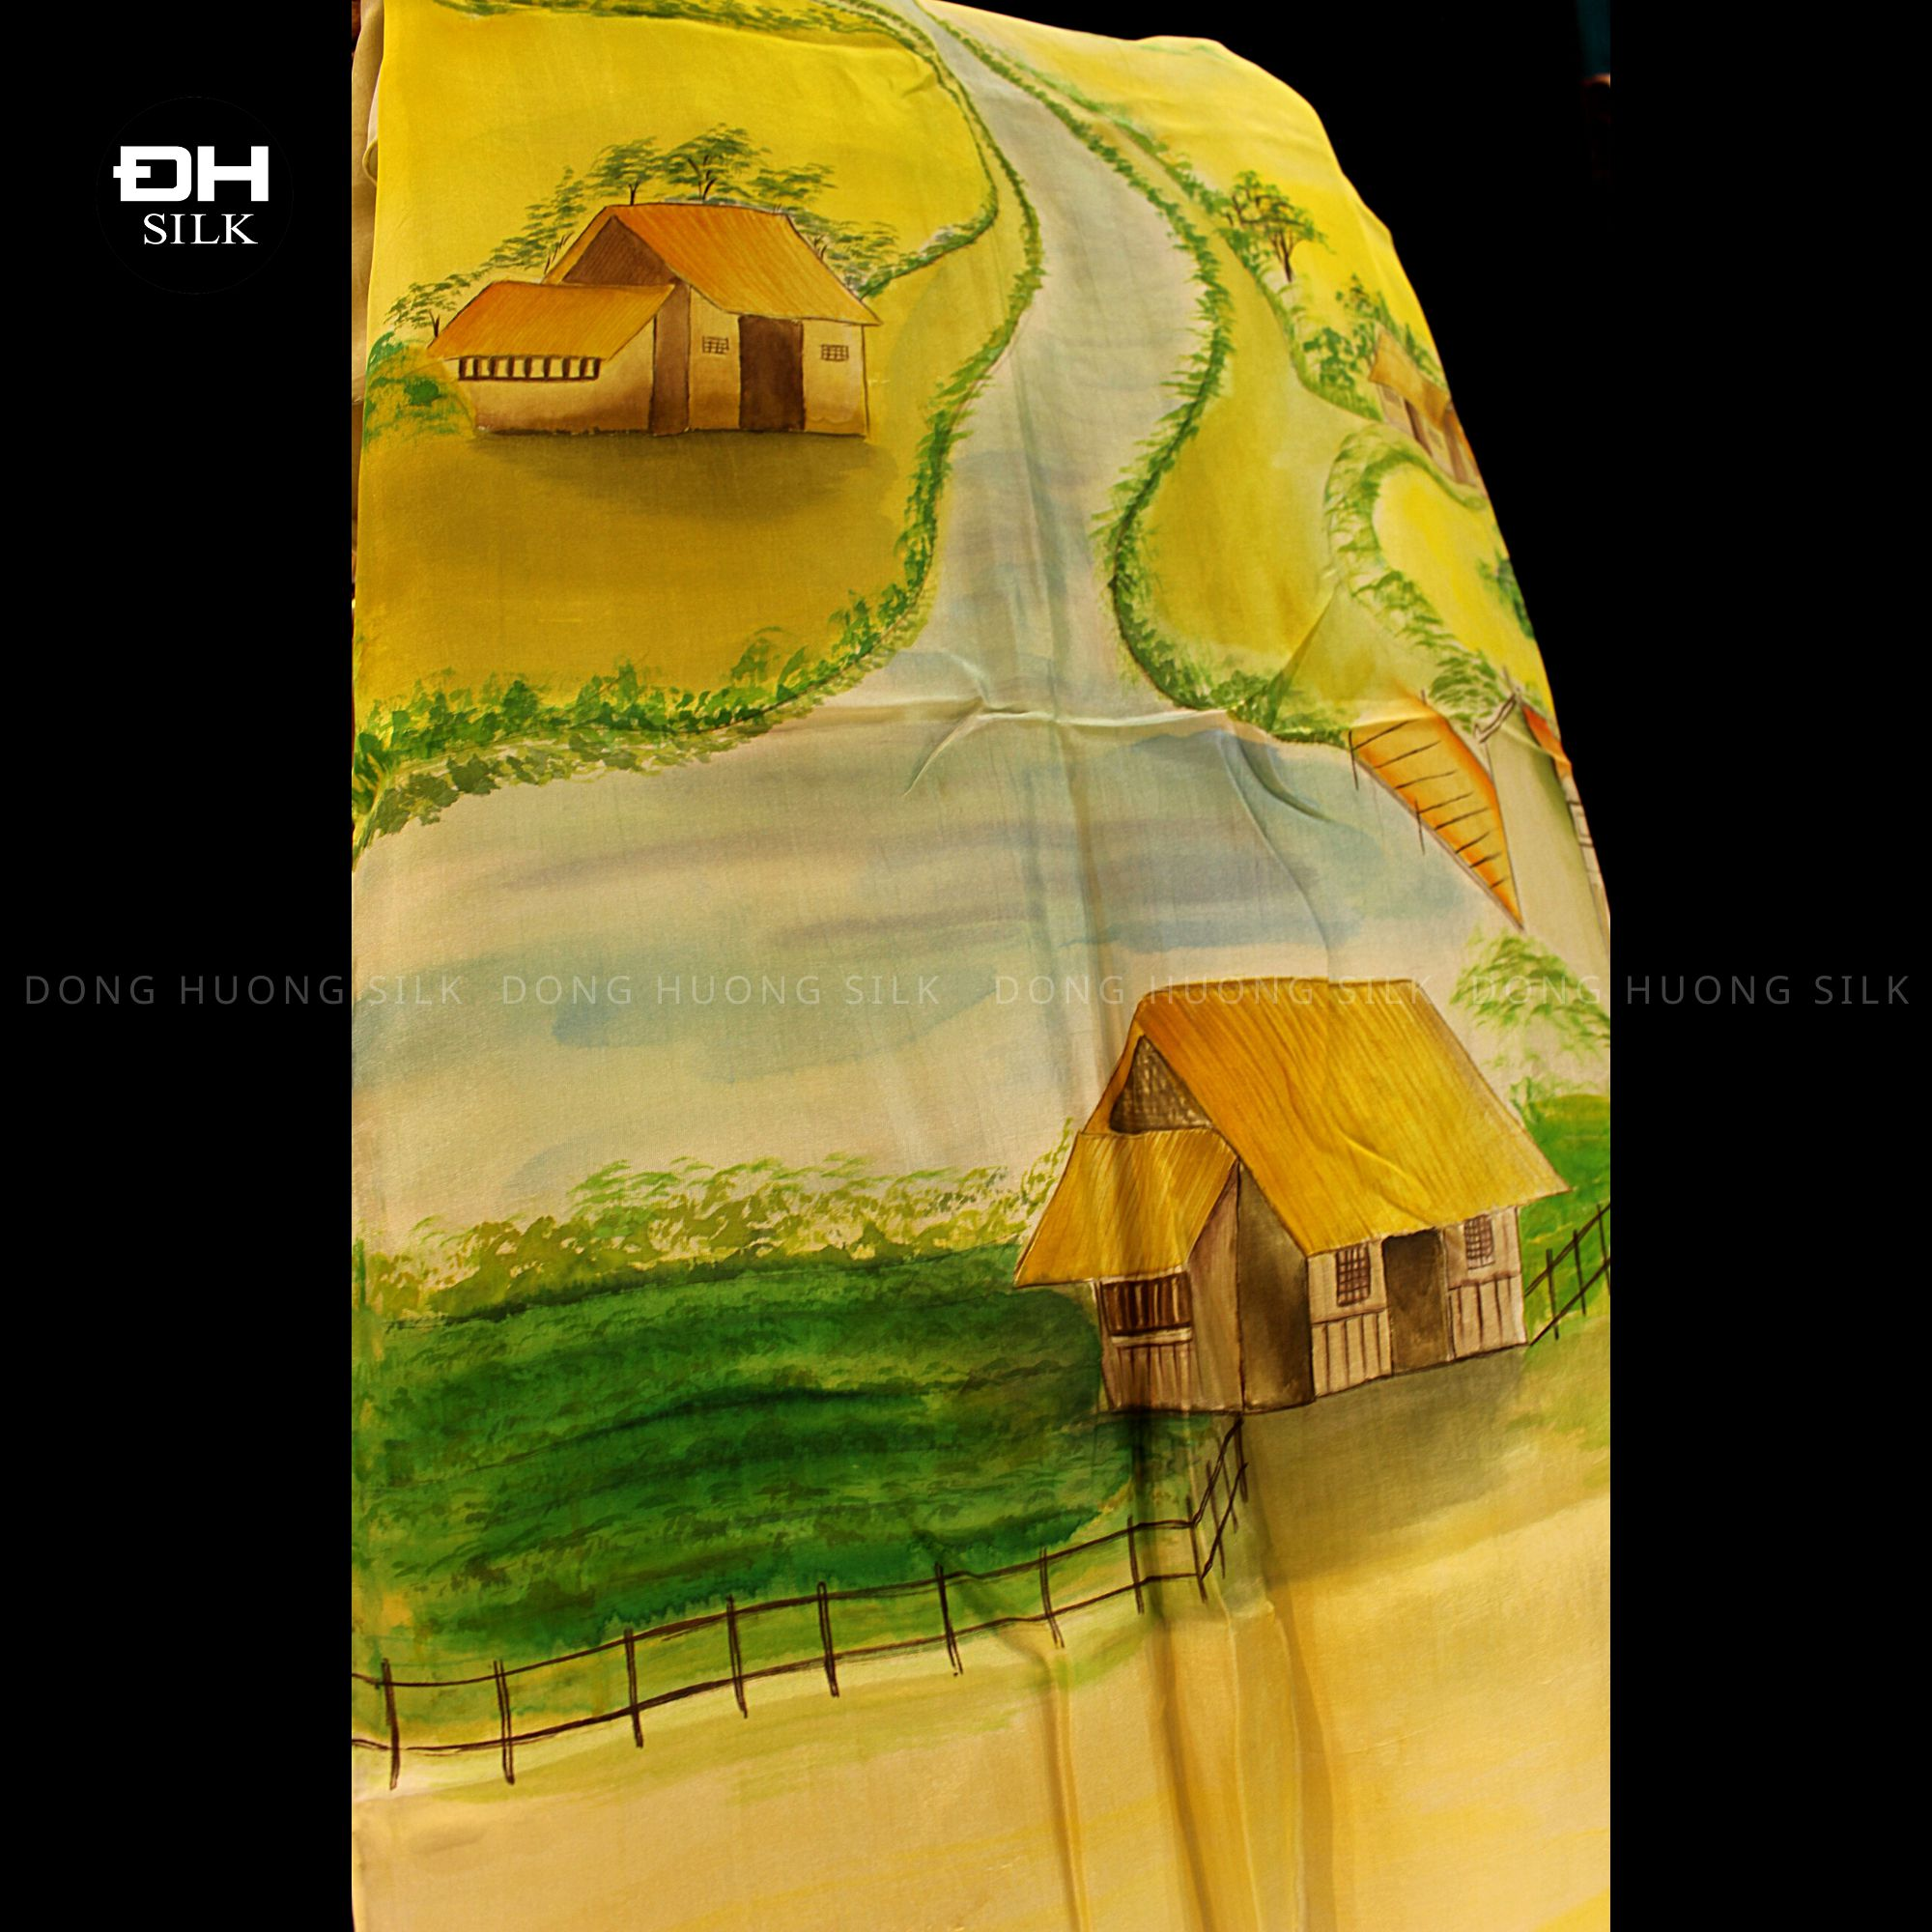 khan-lua-to-tam-ve-tay-nghe-thuat-chu-de-dong-que-Viet-Nam-Dong-Huong-Silk-4